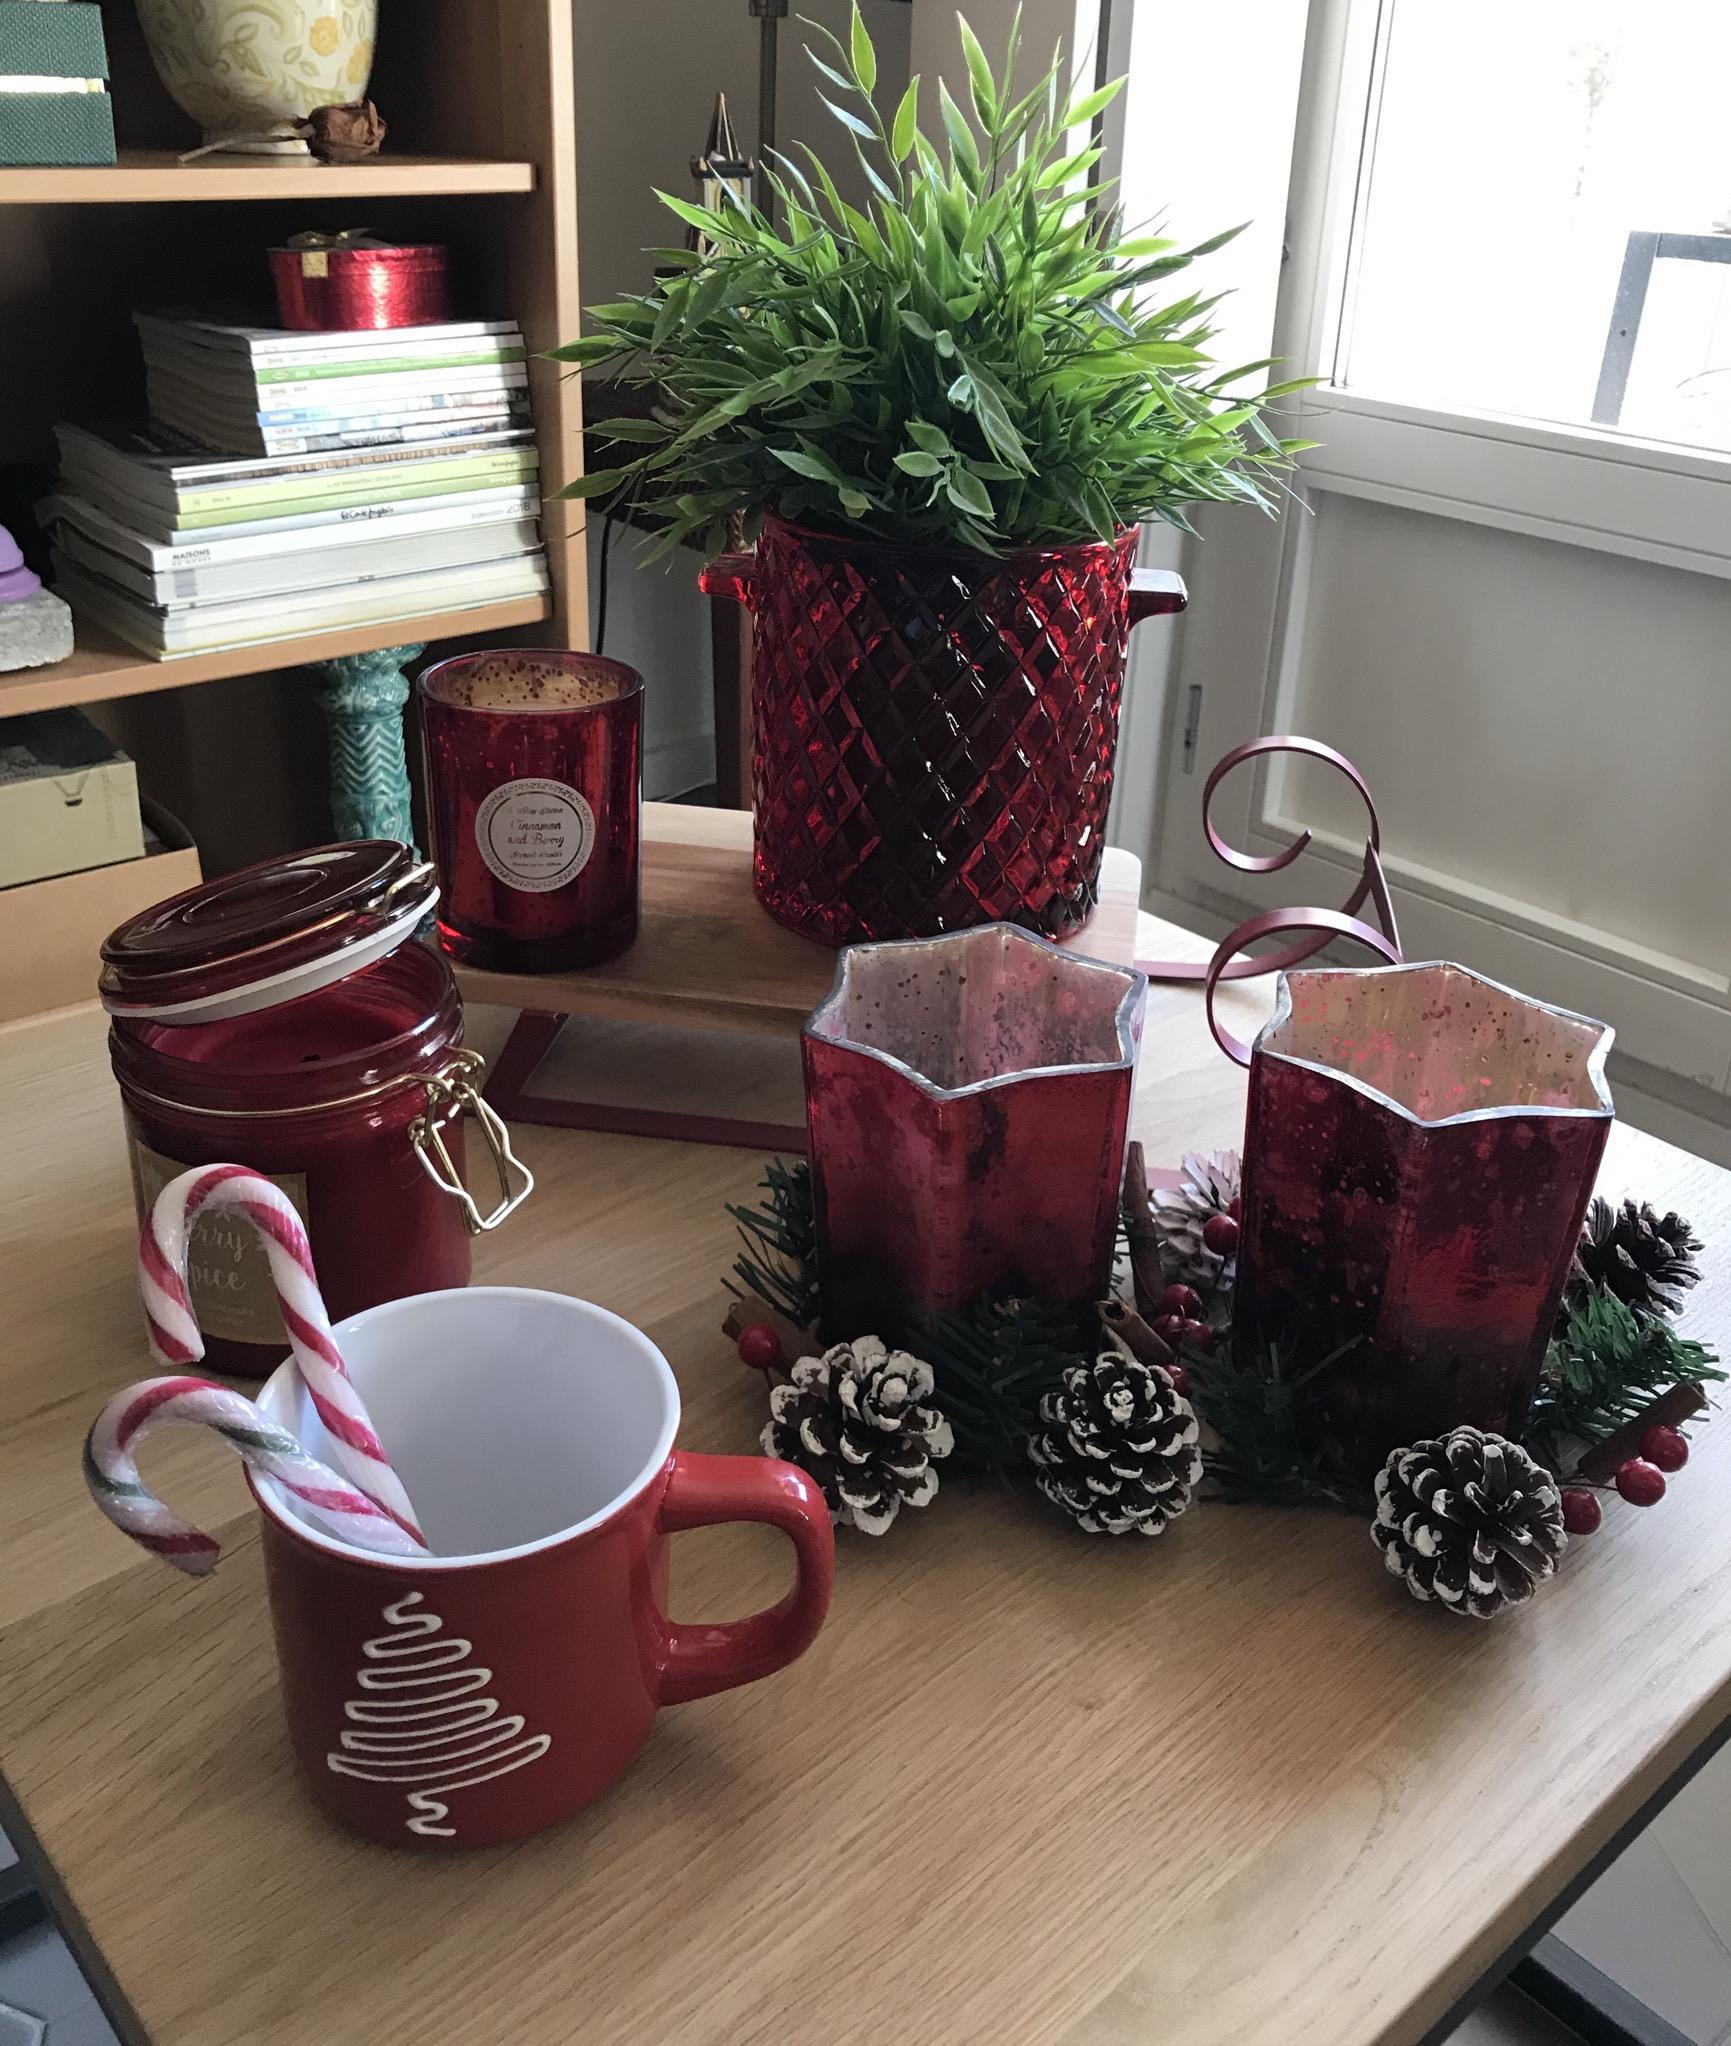 Trineo Navidad - Zara Home